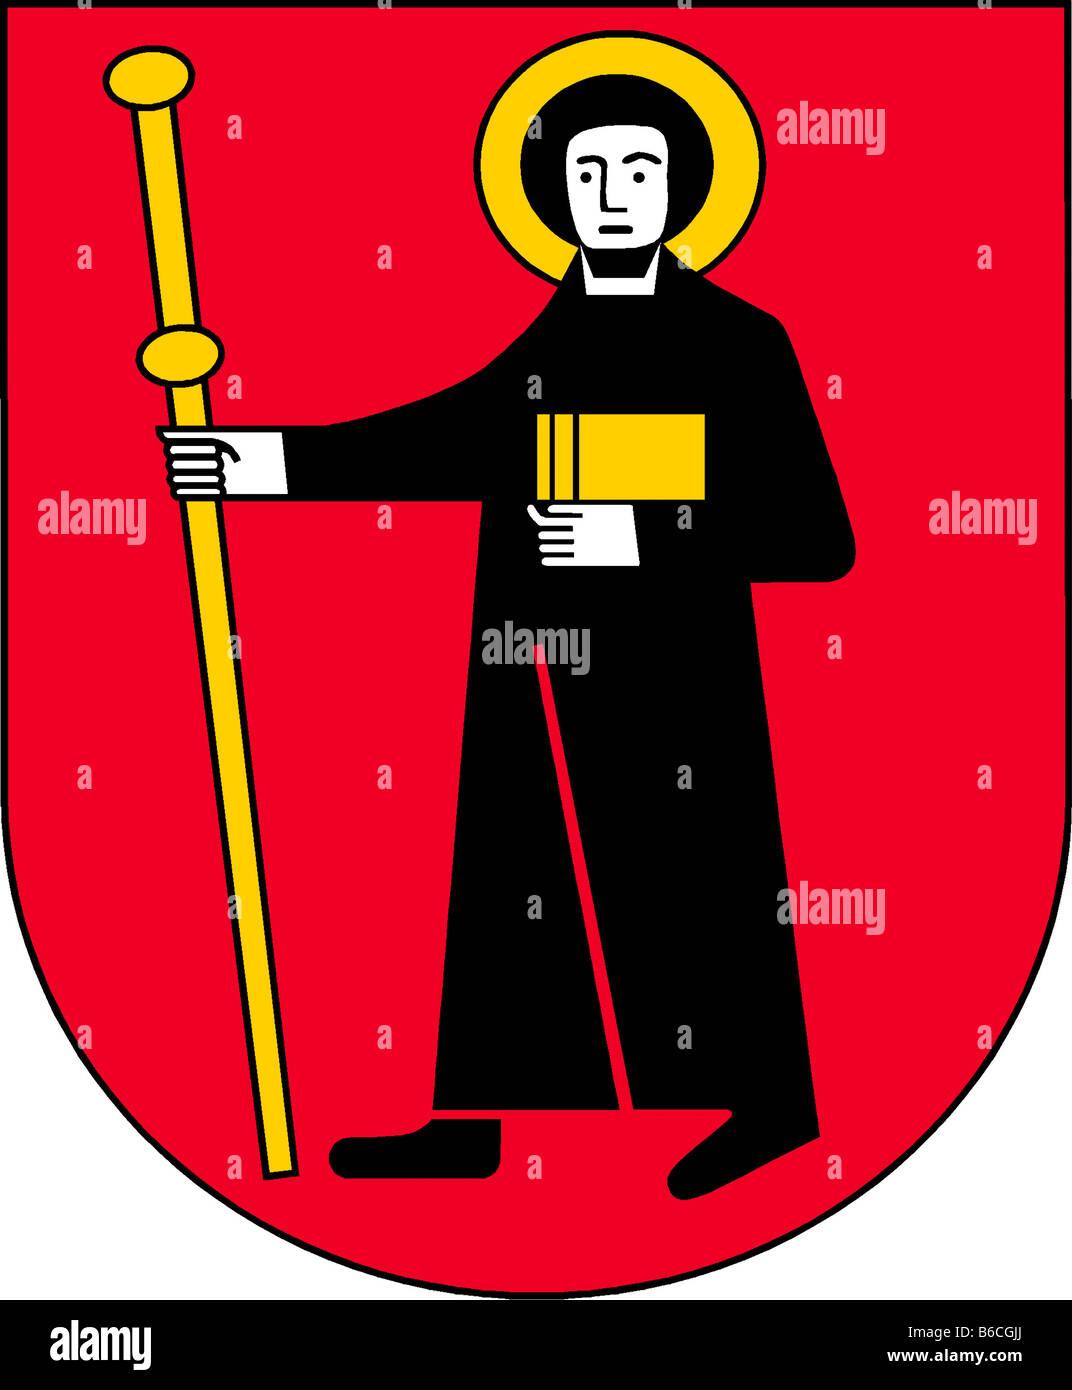 illustration flag of canton of glarus switzerland - Stock Image